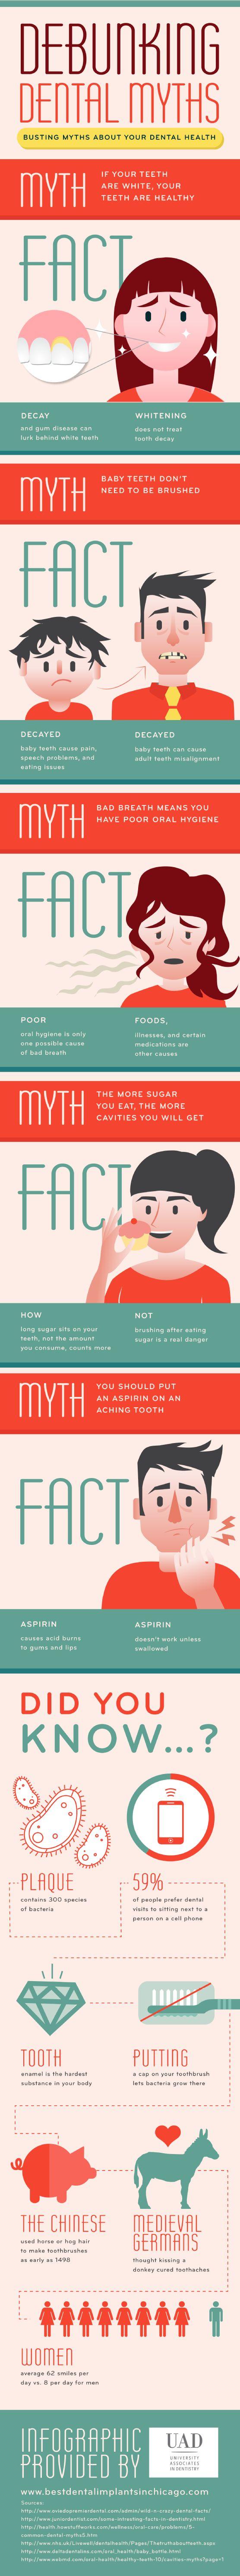 Debunking Dental Myths   #Infographic #DentalMyths #Health